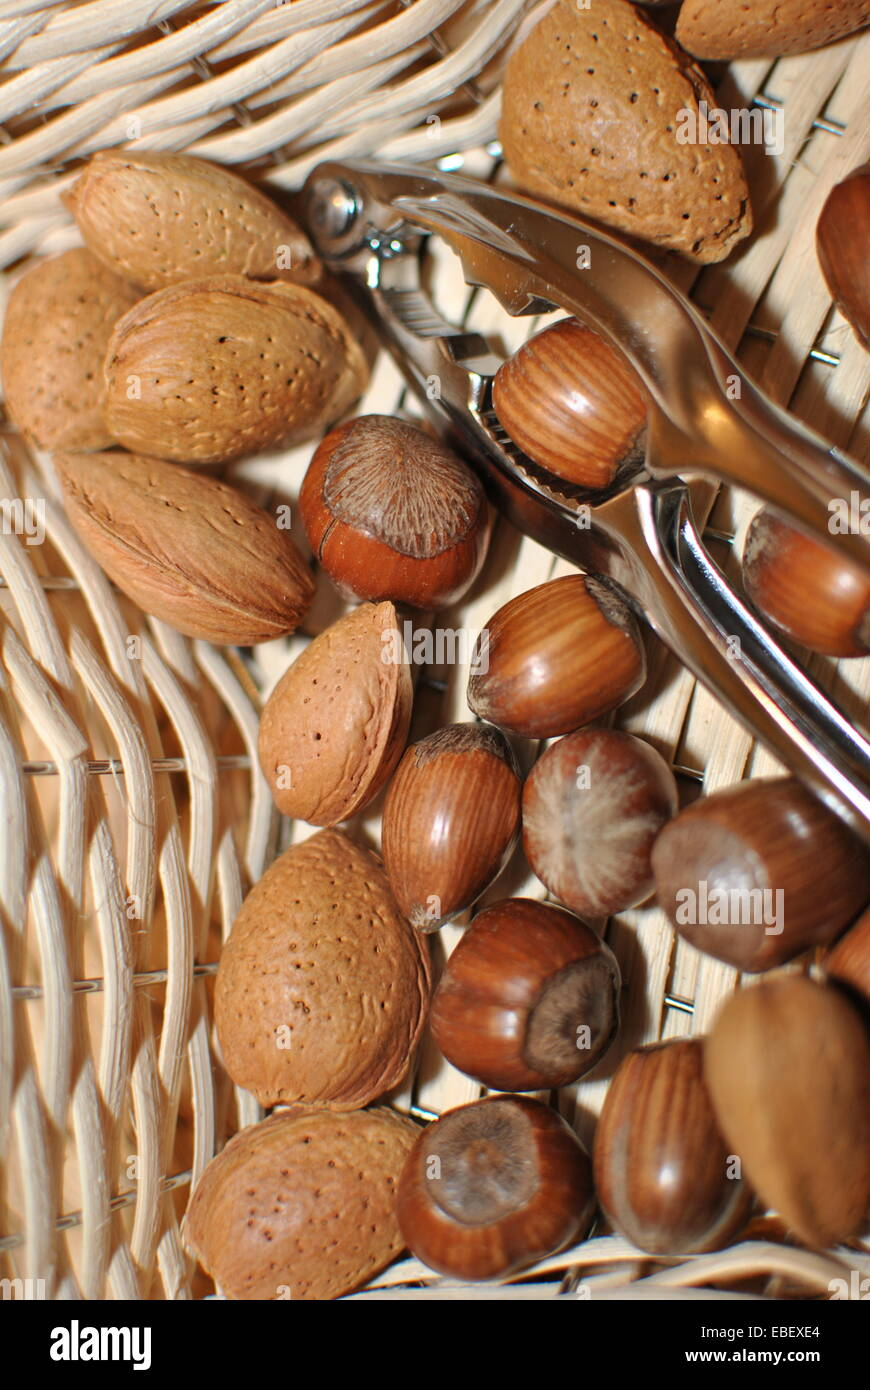 fresh mixed nuts - Stock Image